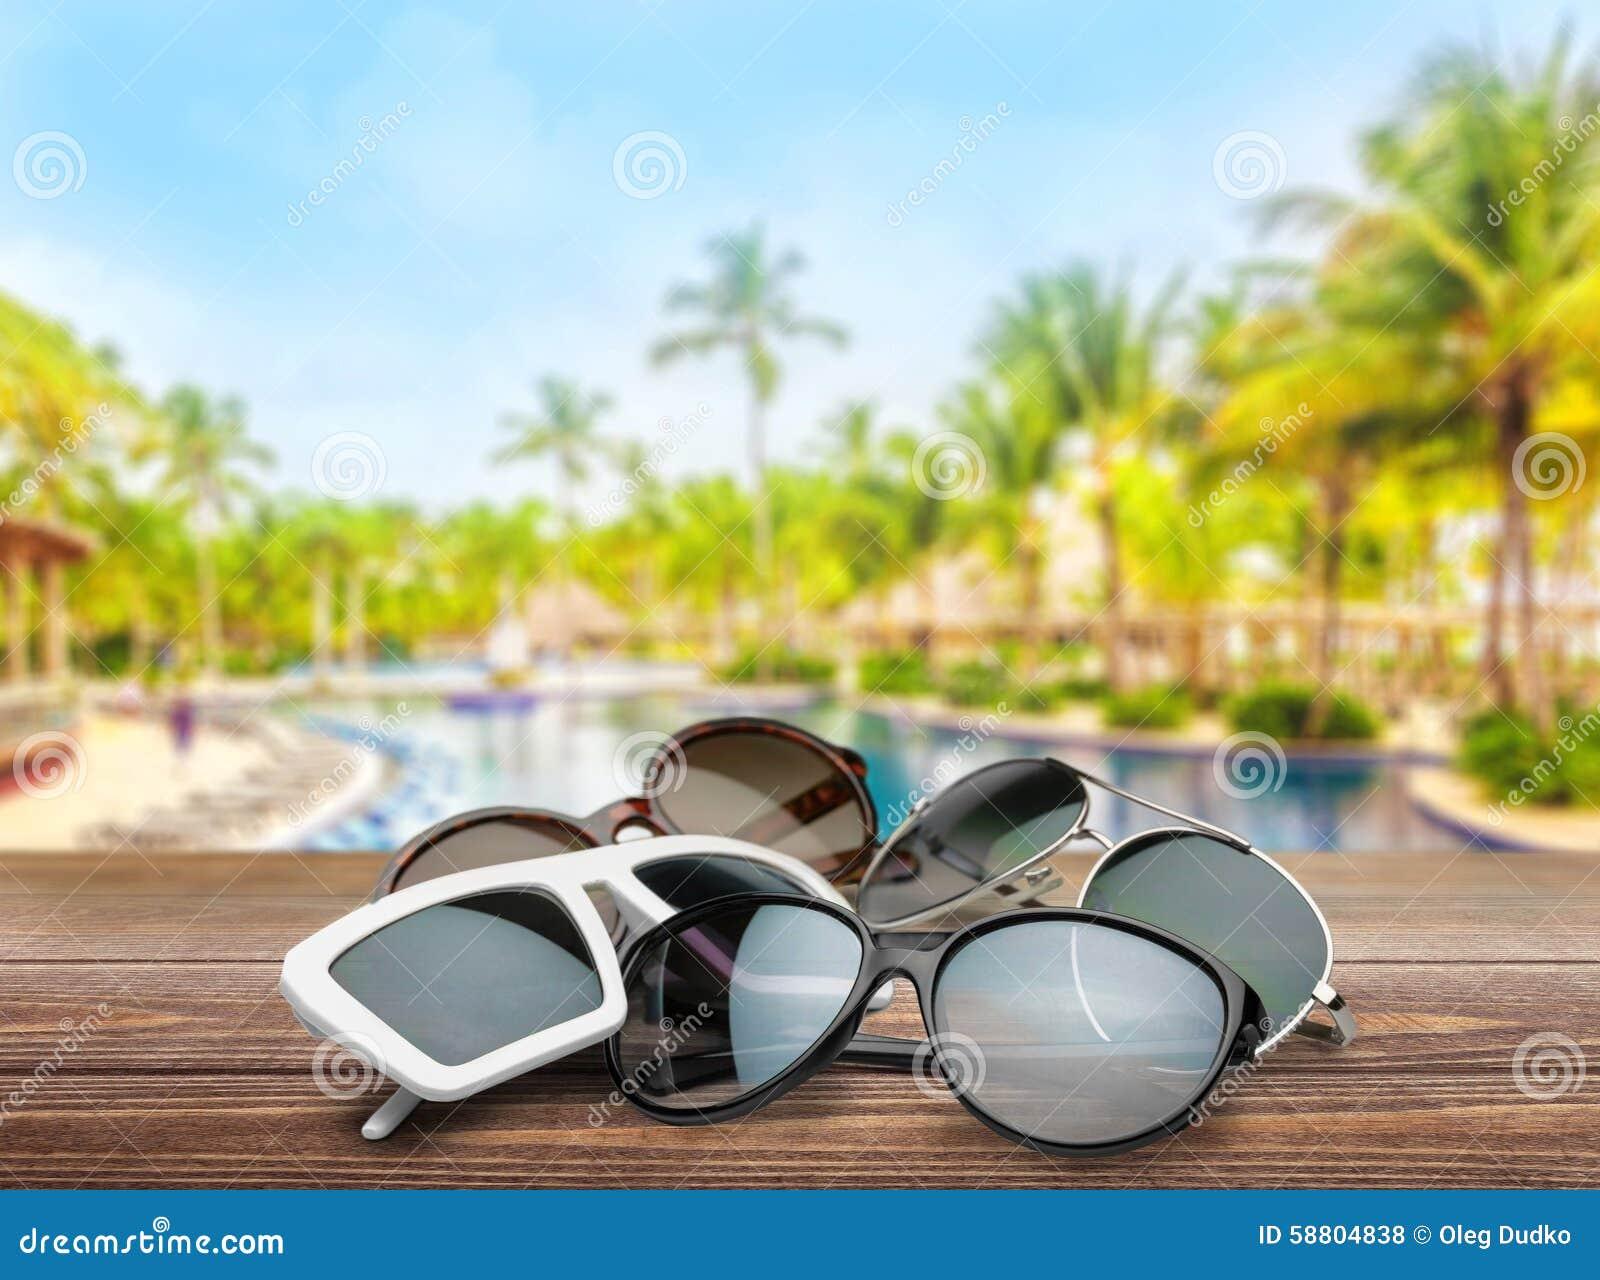 3dddd7d7a8 Απομονωμένο λευκό προσωπικών εξαρτημάτων μόδας Eyewear γυαλιών ηλίου  γυναίκες